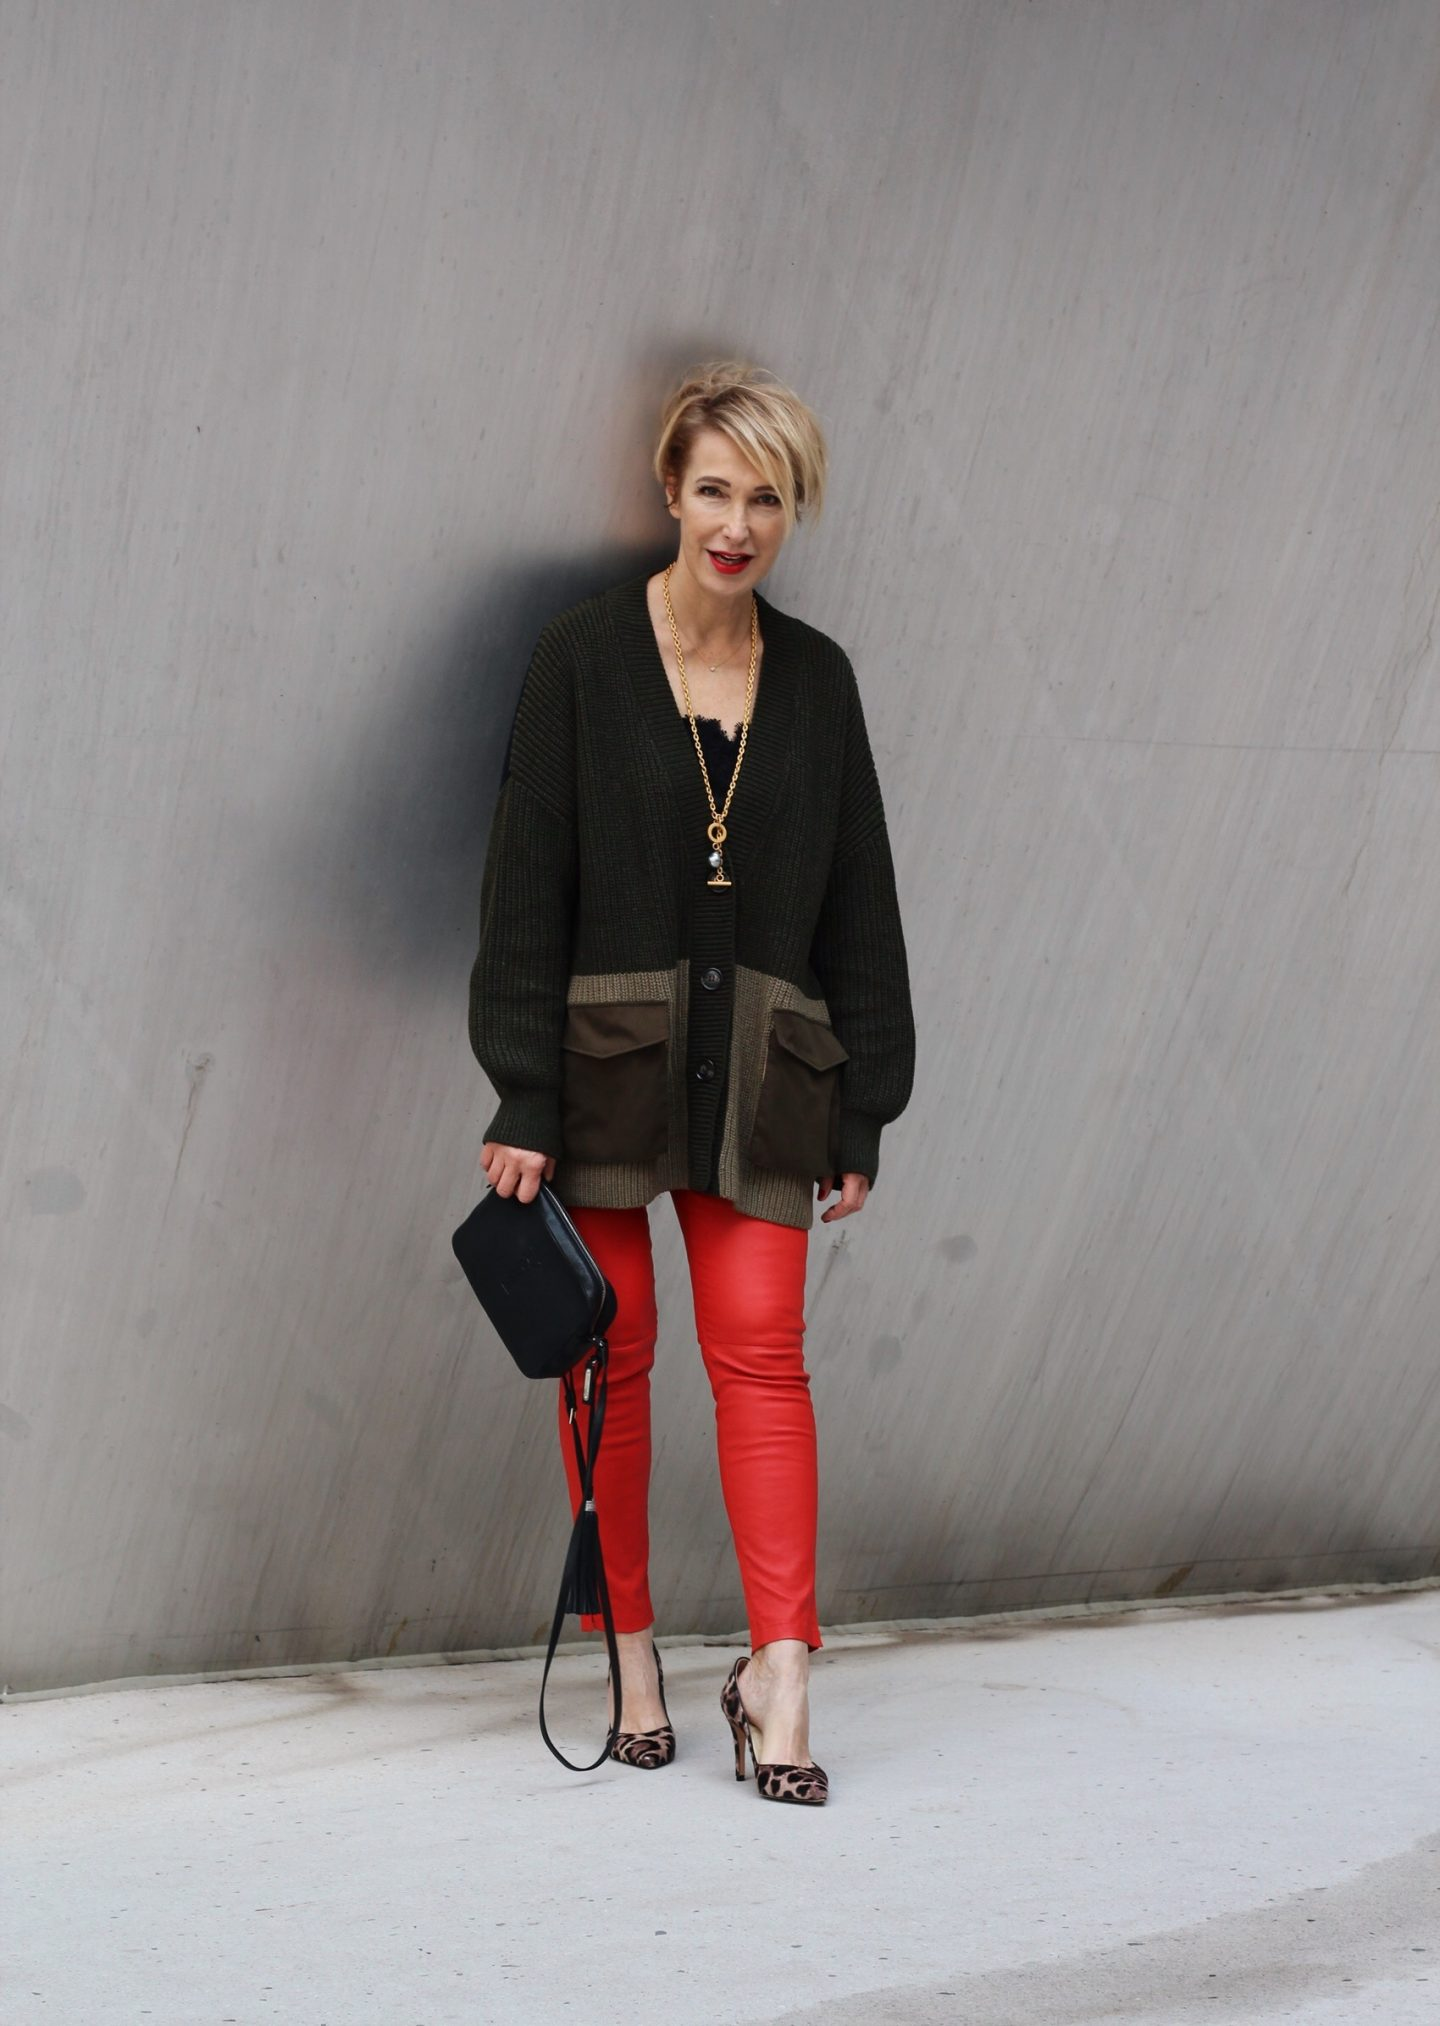 glamupyourlifestyle accessoires outfit hingucker rote-lederlegging ue-40-blog ue-50-blog ü-50-mode